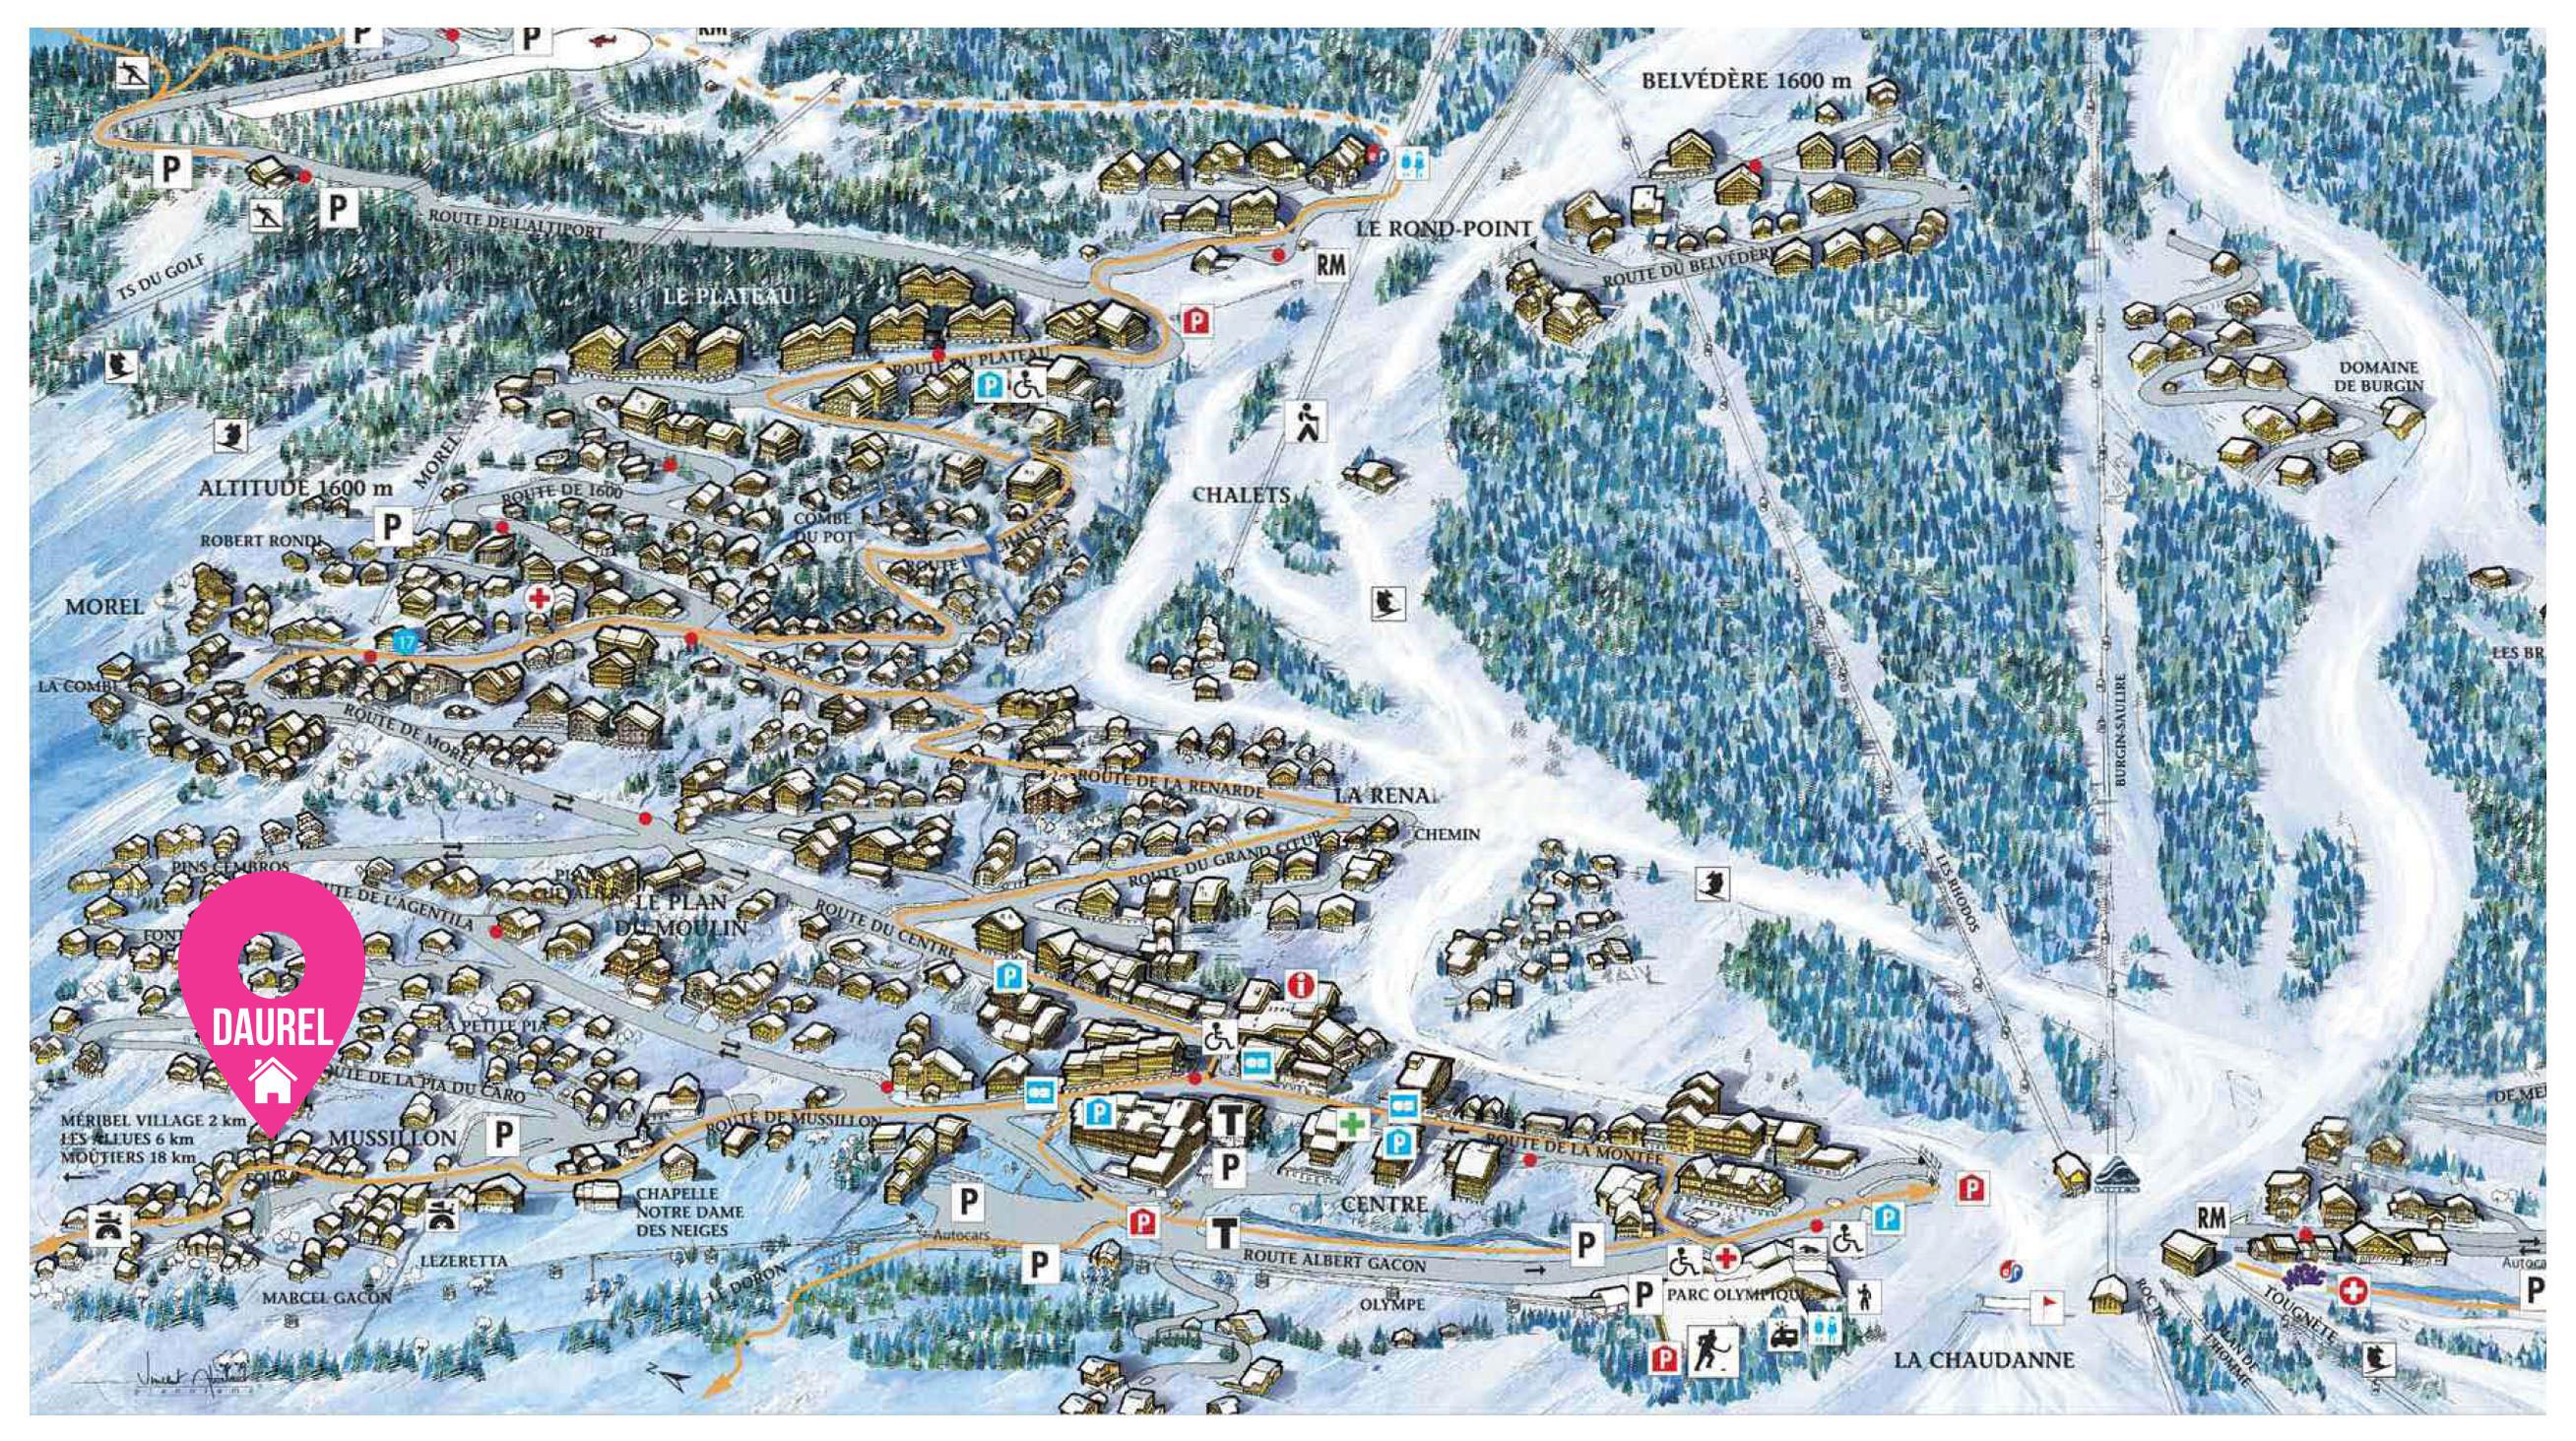 Map of Chalet Daurel